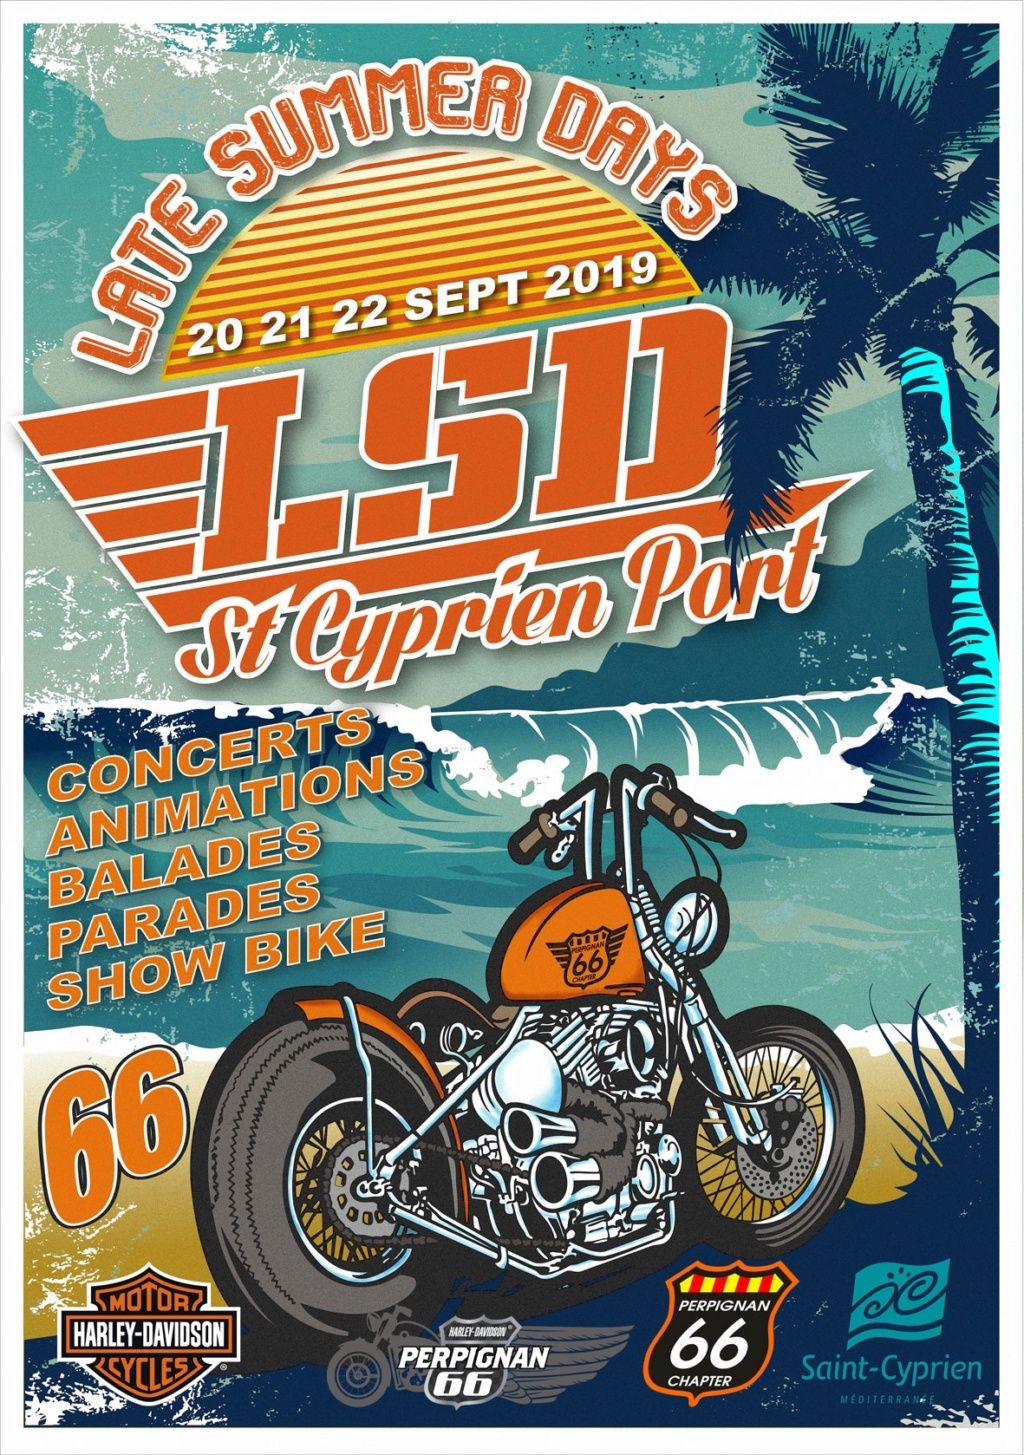 MANIFESTATION - Late Summer Days - 20-21-22 Septembre 2019 - Saint - Cyprien (66)  5d540b10